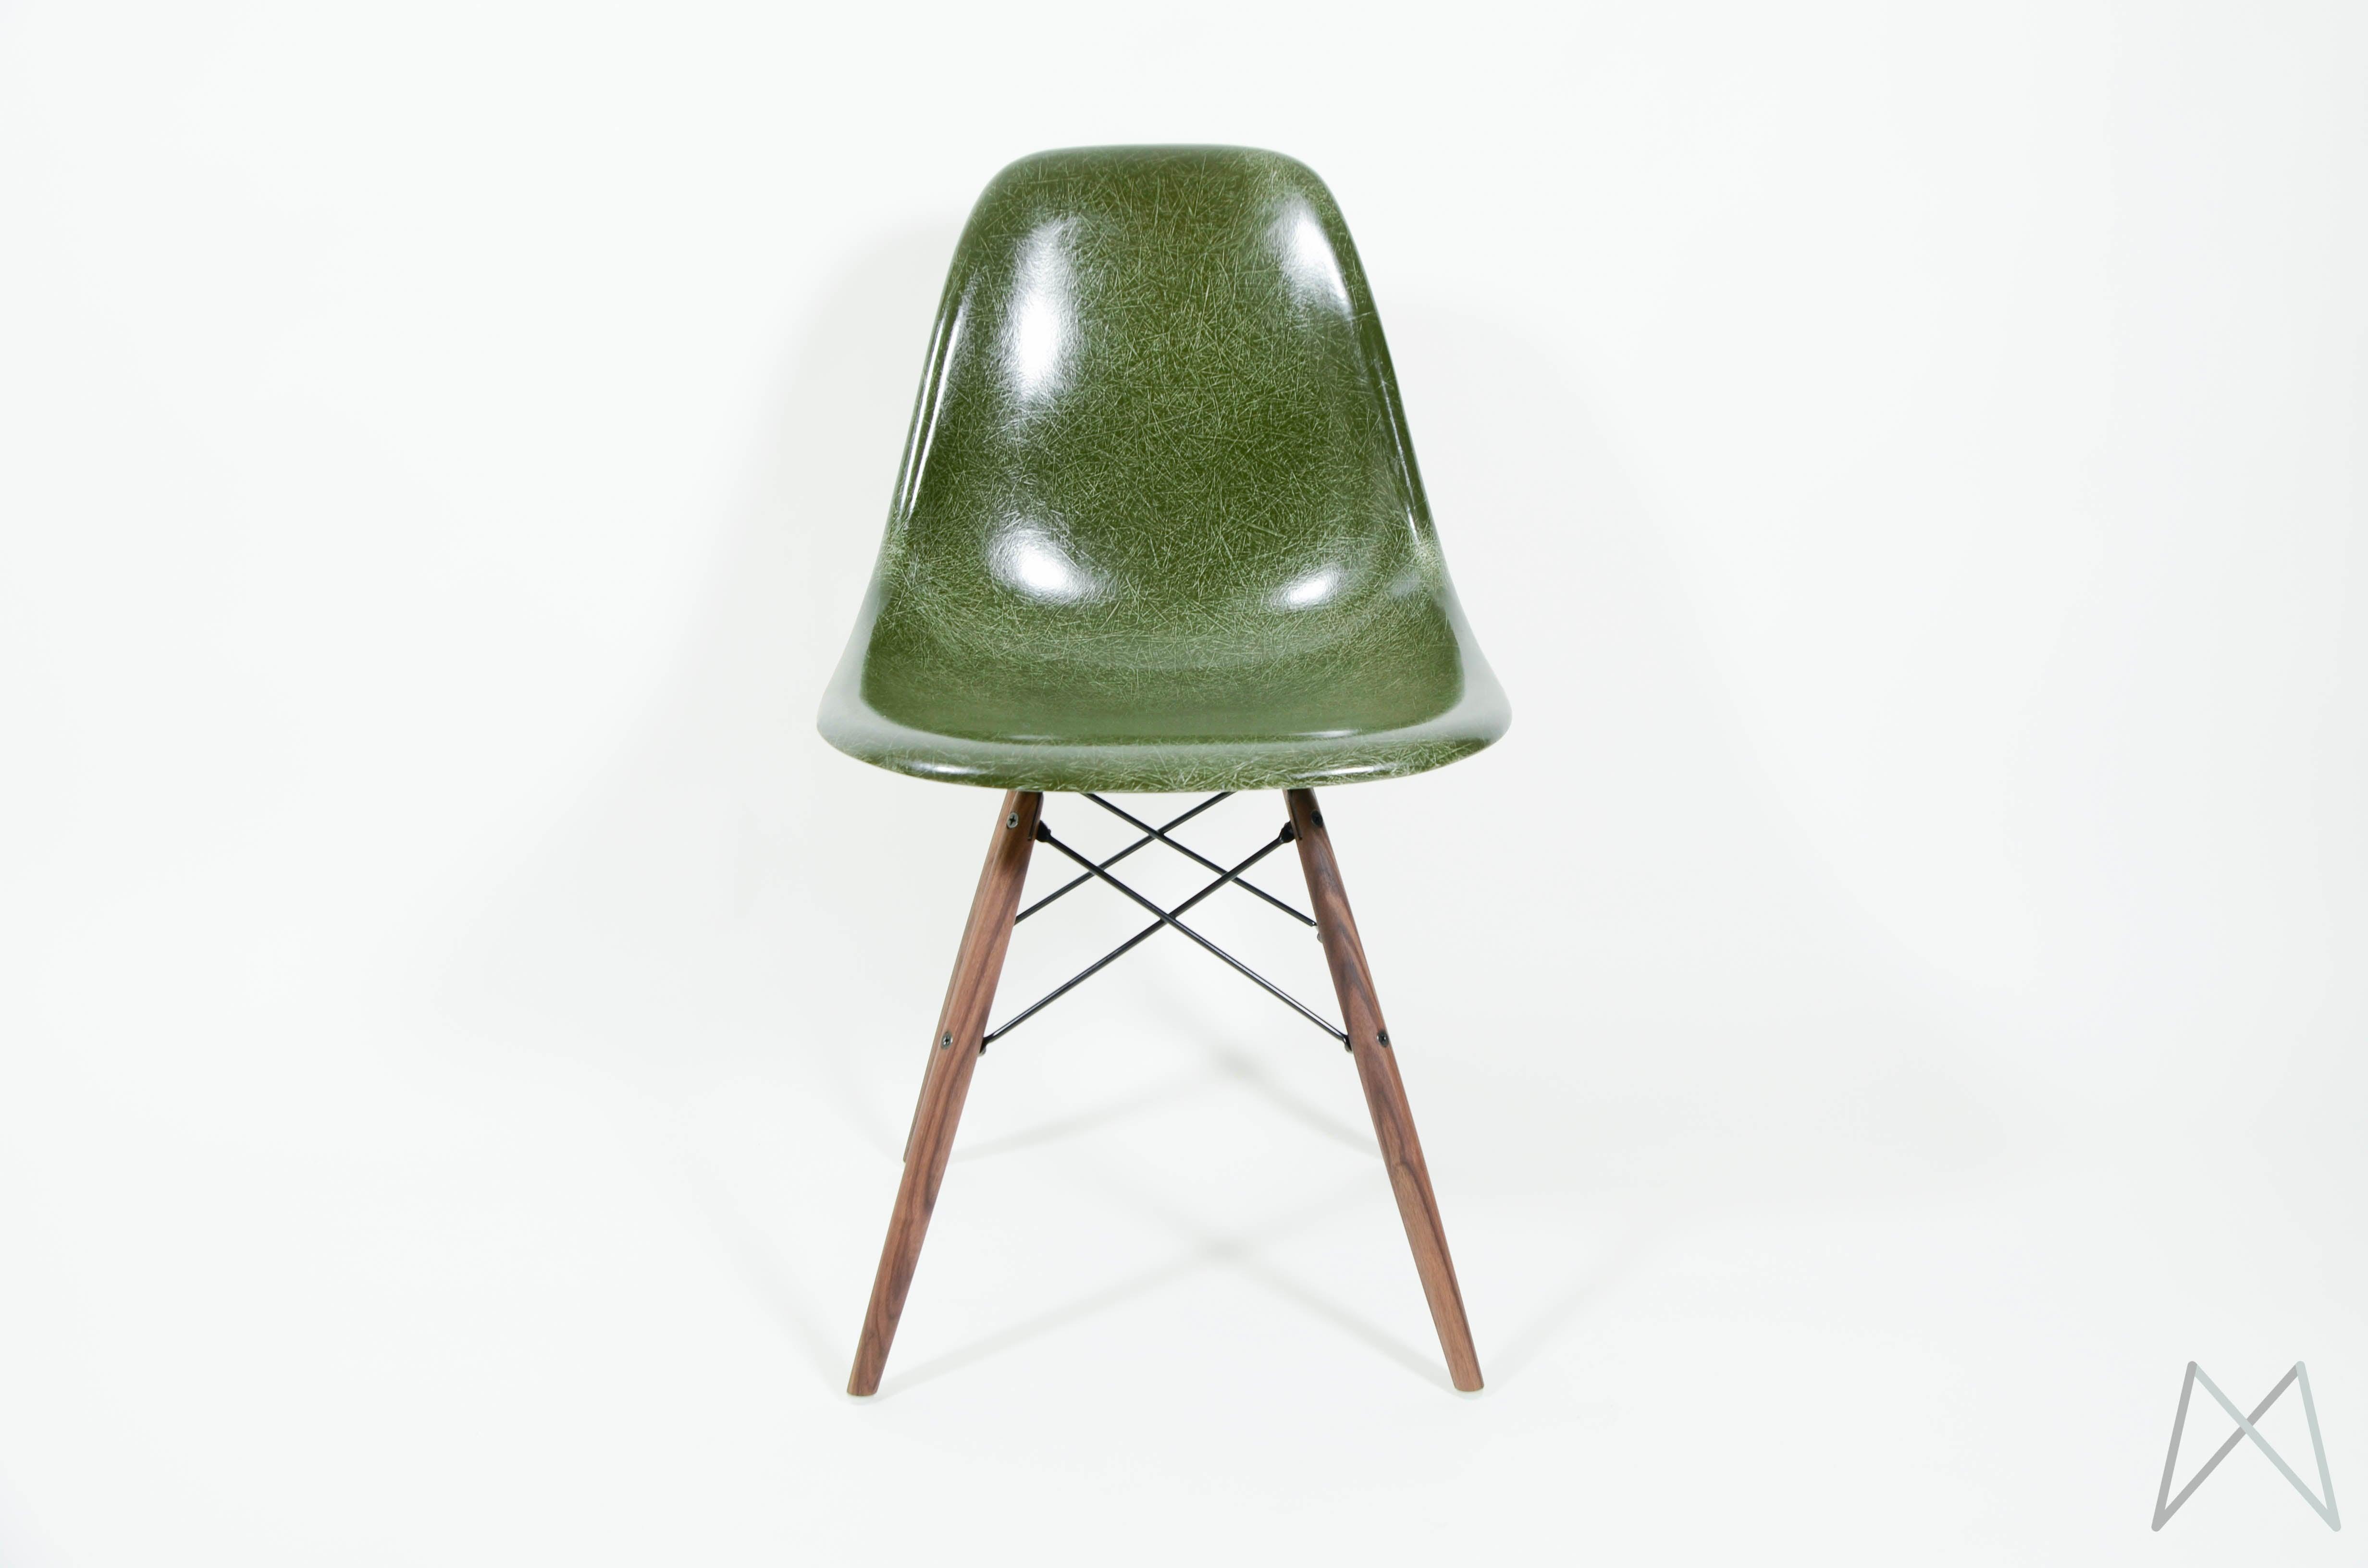 Modern Vintage Amsterdam Original Eames Furniture Eames Herman